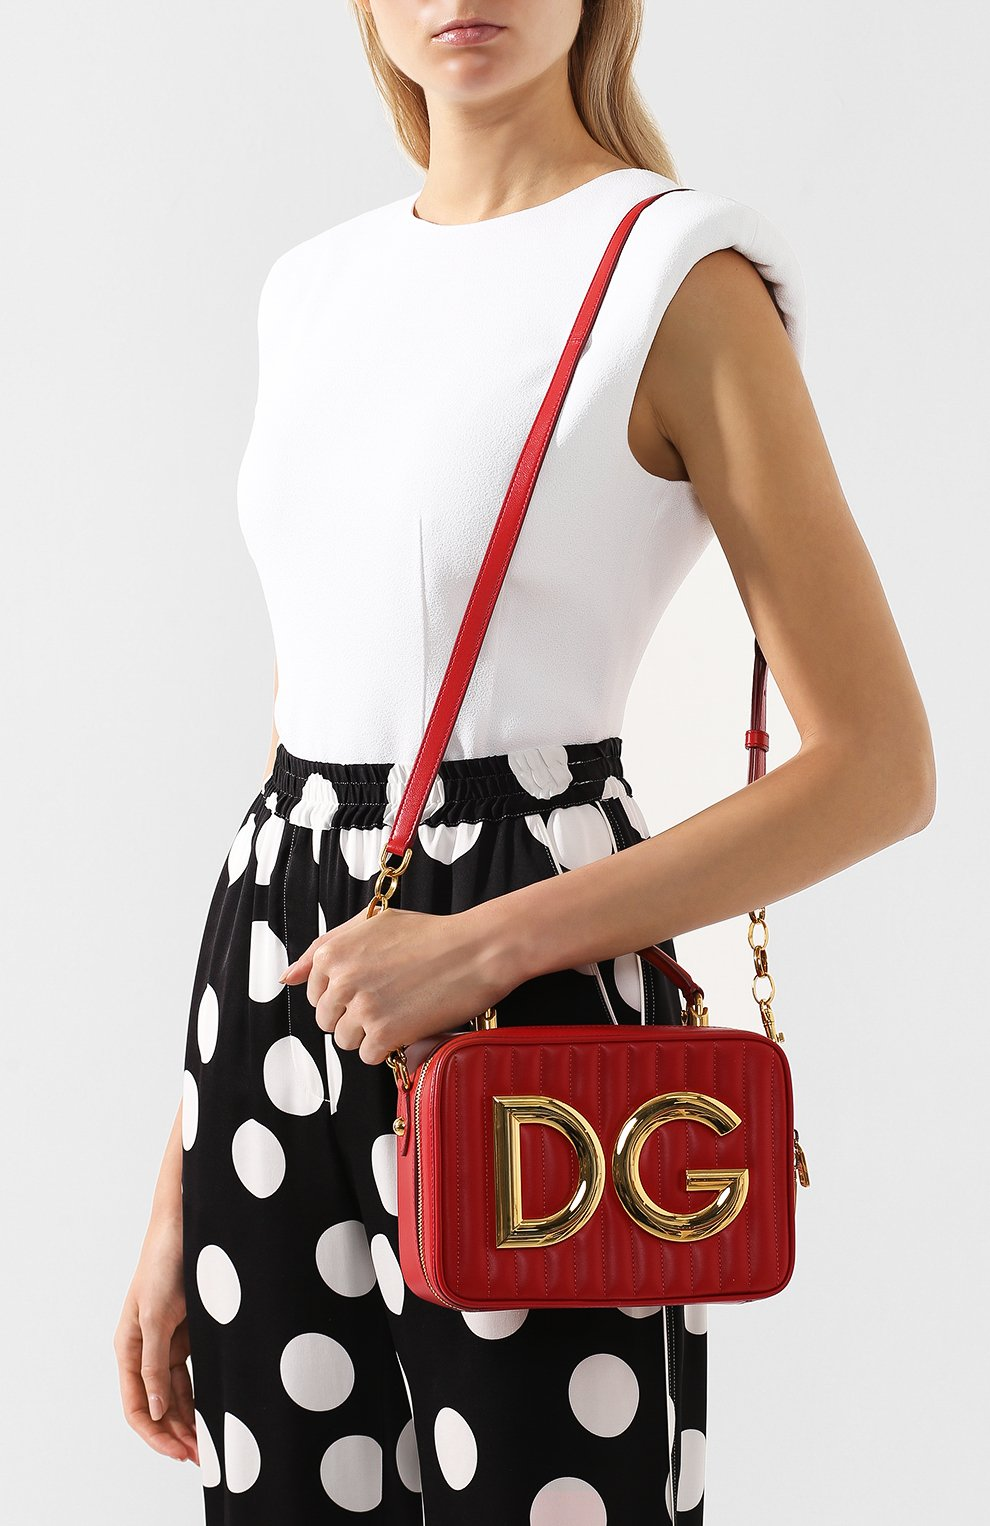 Сумка DG Girls Dolce & Gabbana красная цвета | Фото №5